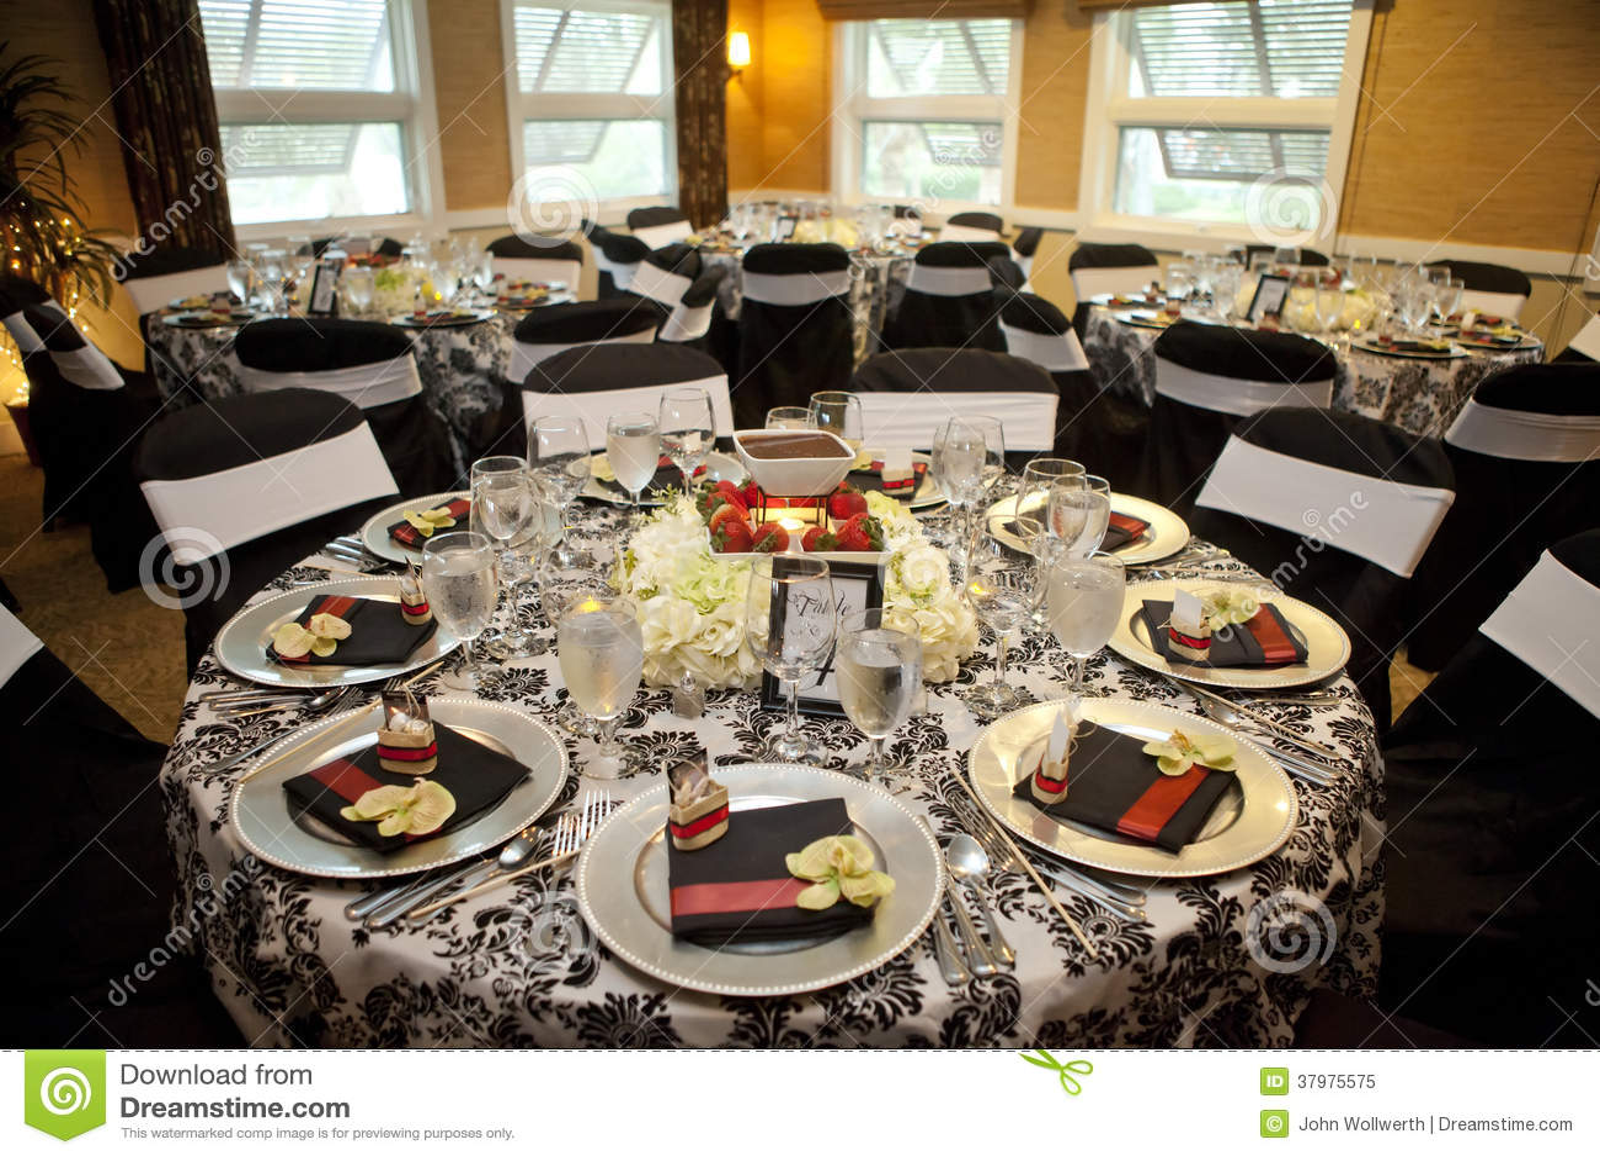 elegant setup for catered dinner royalty free stock photo - image